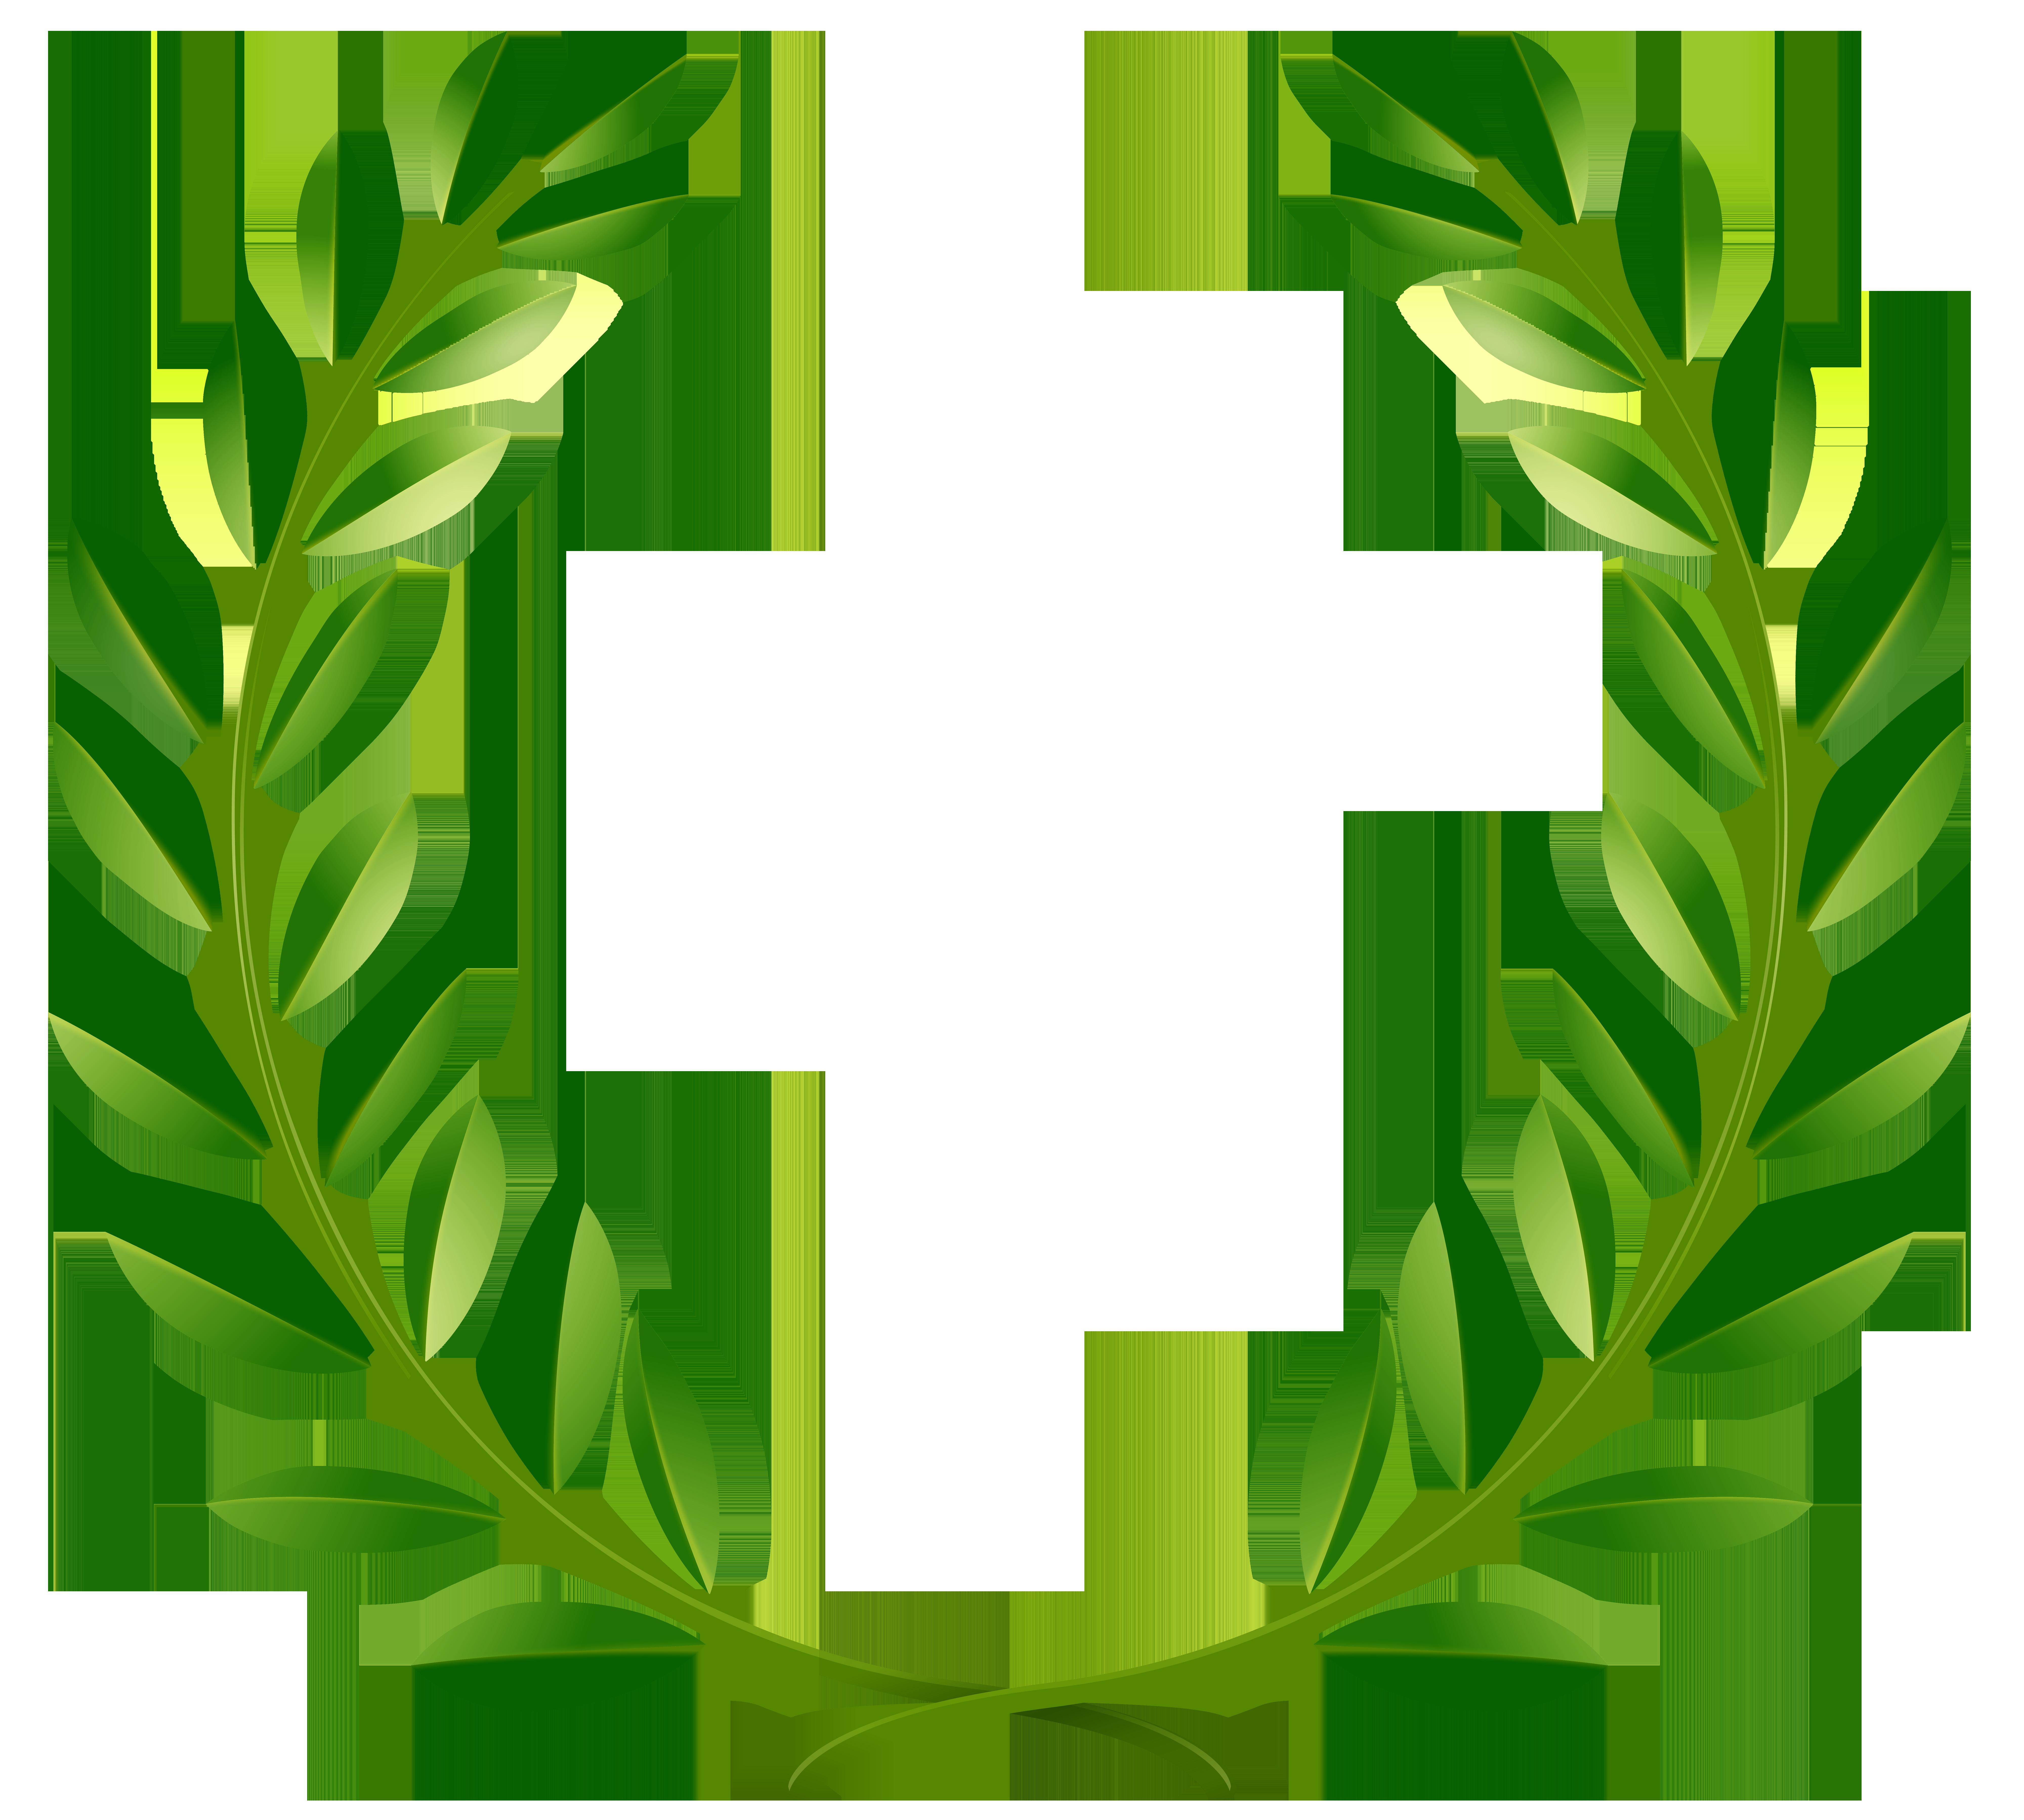 Laurel clipart green. Leaves png clip art